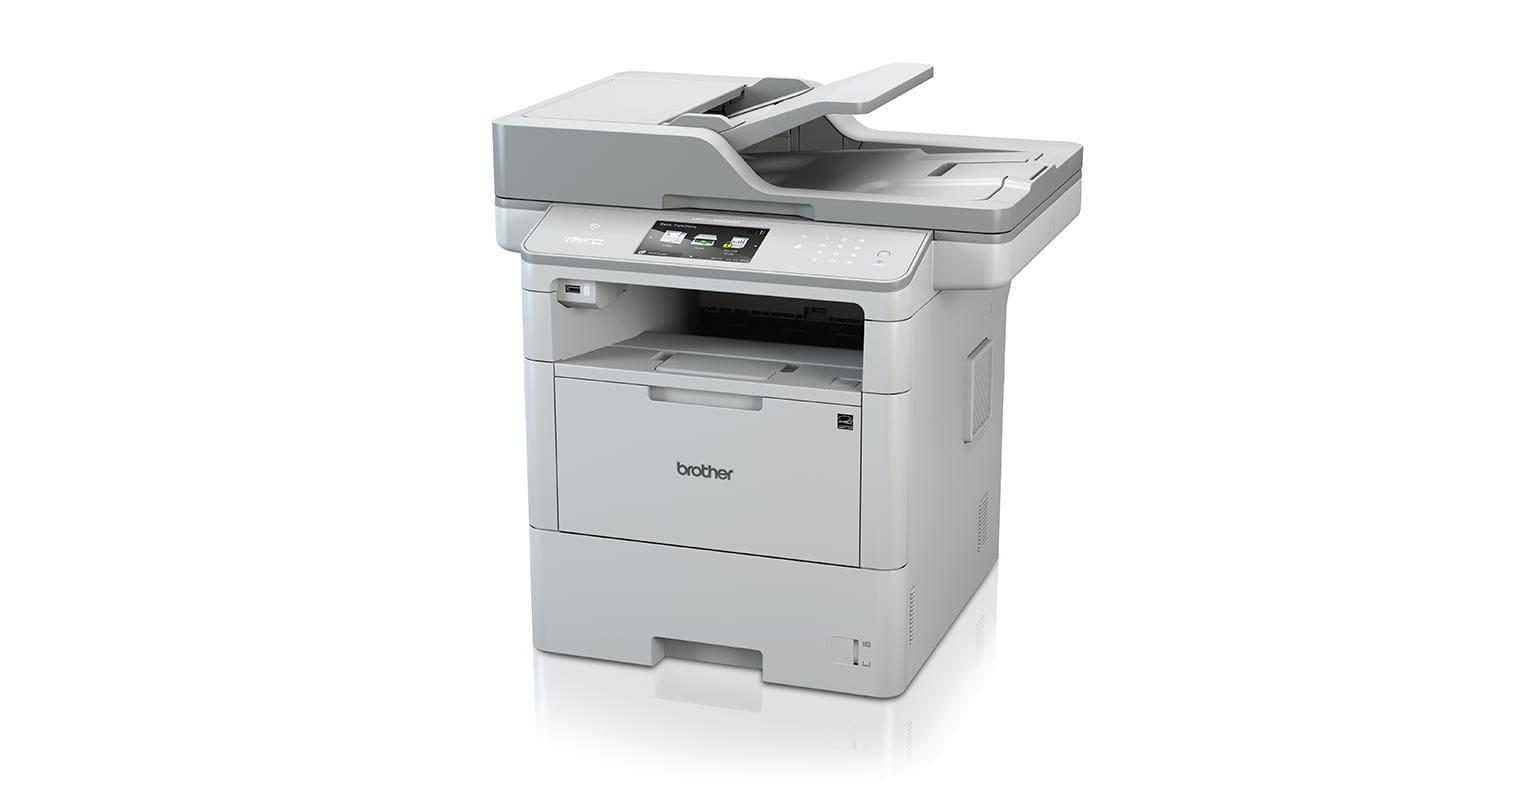 MFC-L6900DW Mono laser printer all-in-one